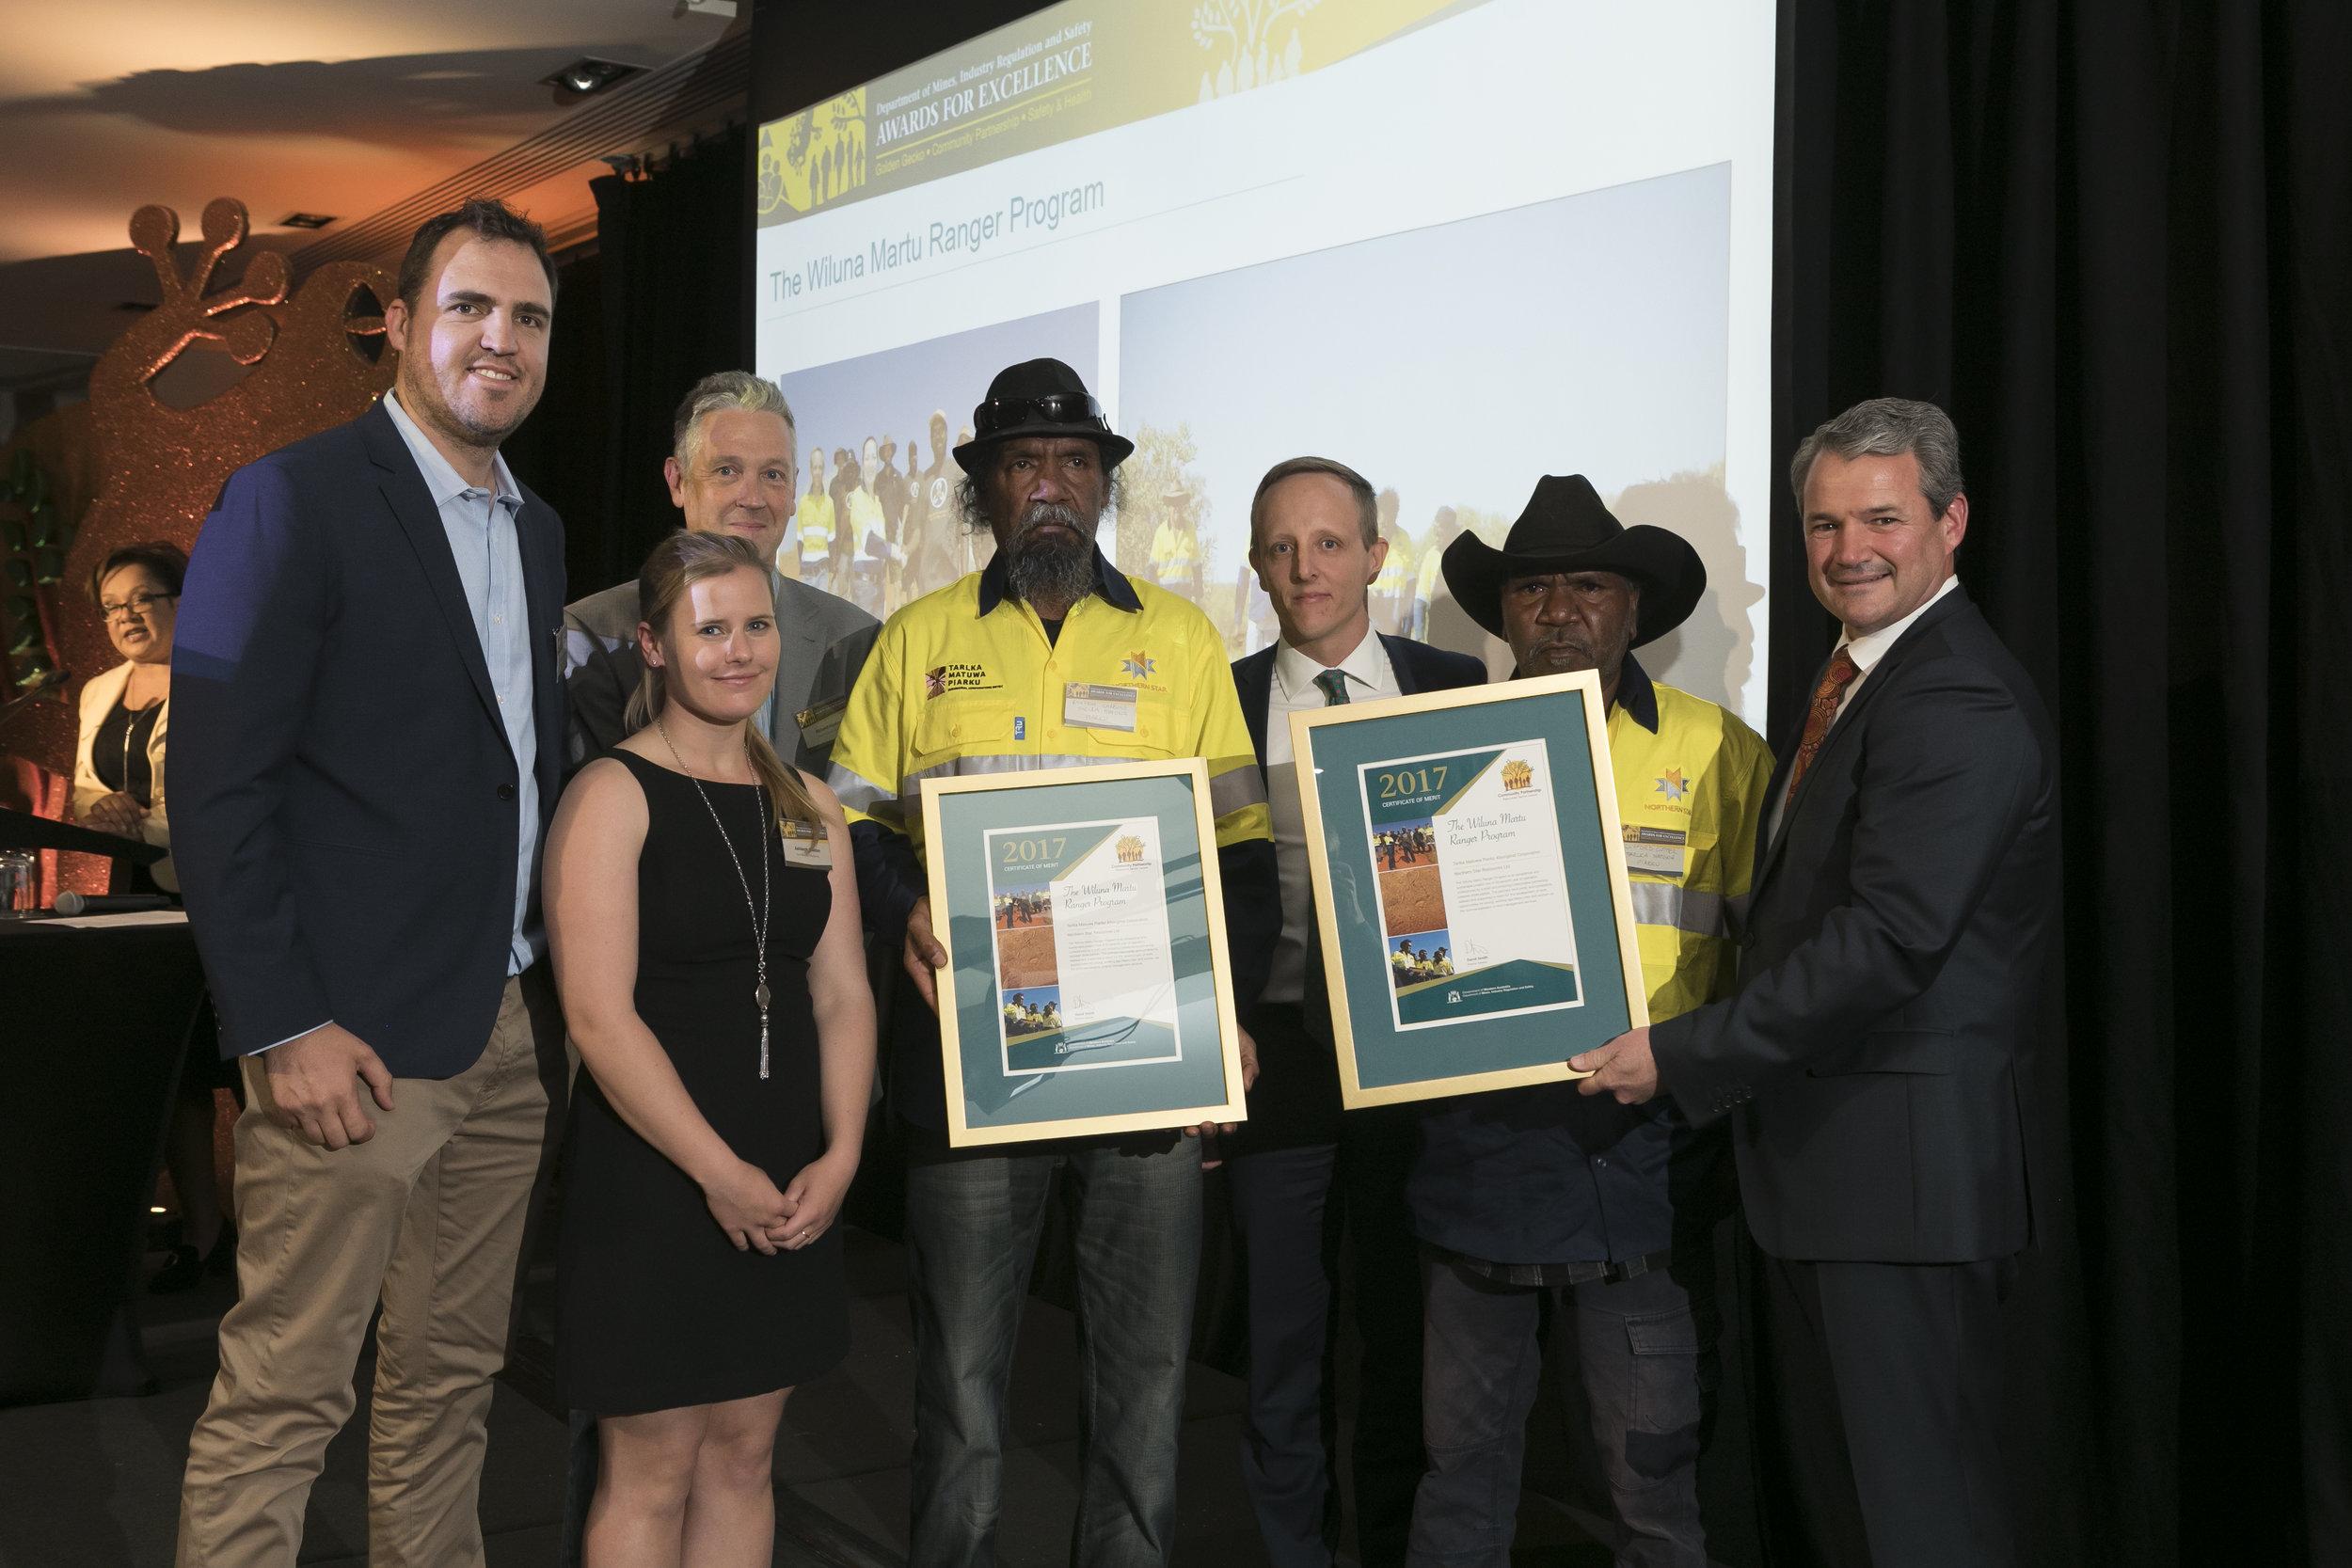 Abraham Van Niekerk, Ashleigh Shelton, Richard Gordine, Ray Carbine, Guy Singleton and Clifford Cutter receiving a Certificate of Merit for the Martu Ranger Program in the 2017 Community Partnership Awards.